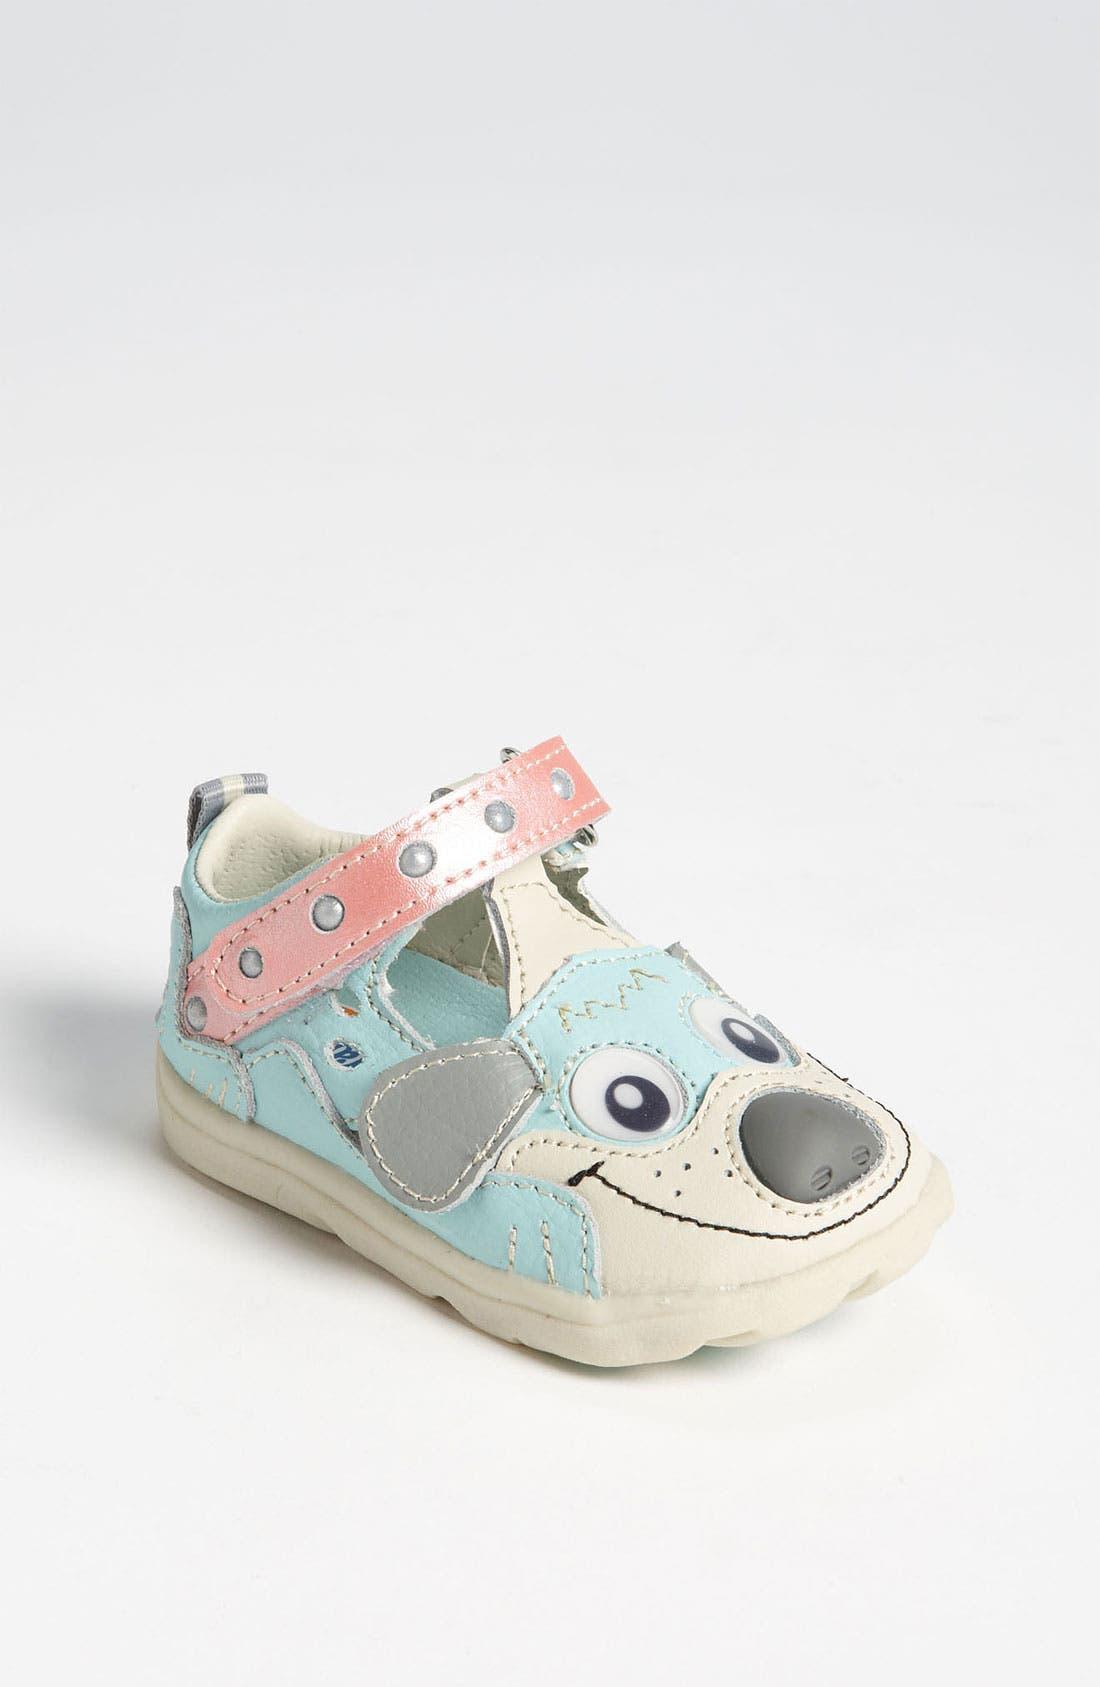 Alternate Image 1 Selected - Zooligans™ 'Puppy' Sport Sandal (Baby, Walker & Toddler)